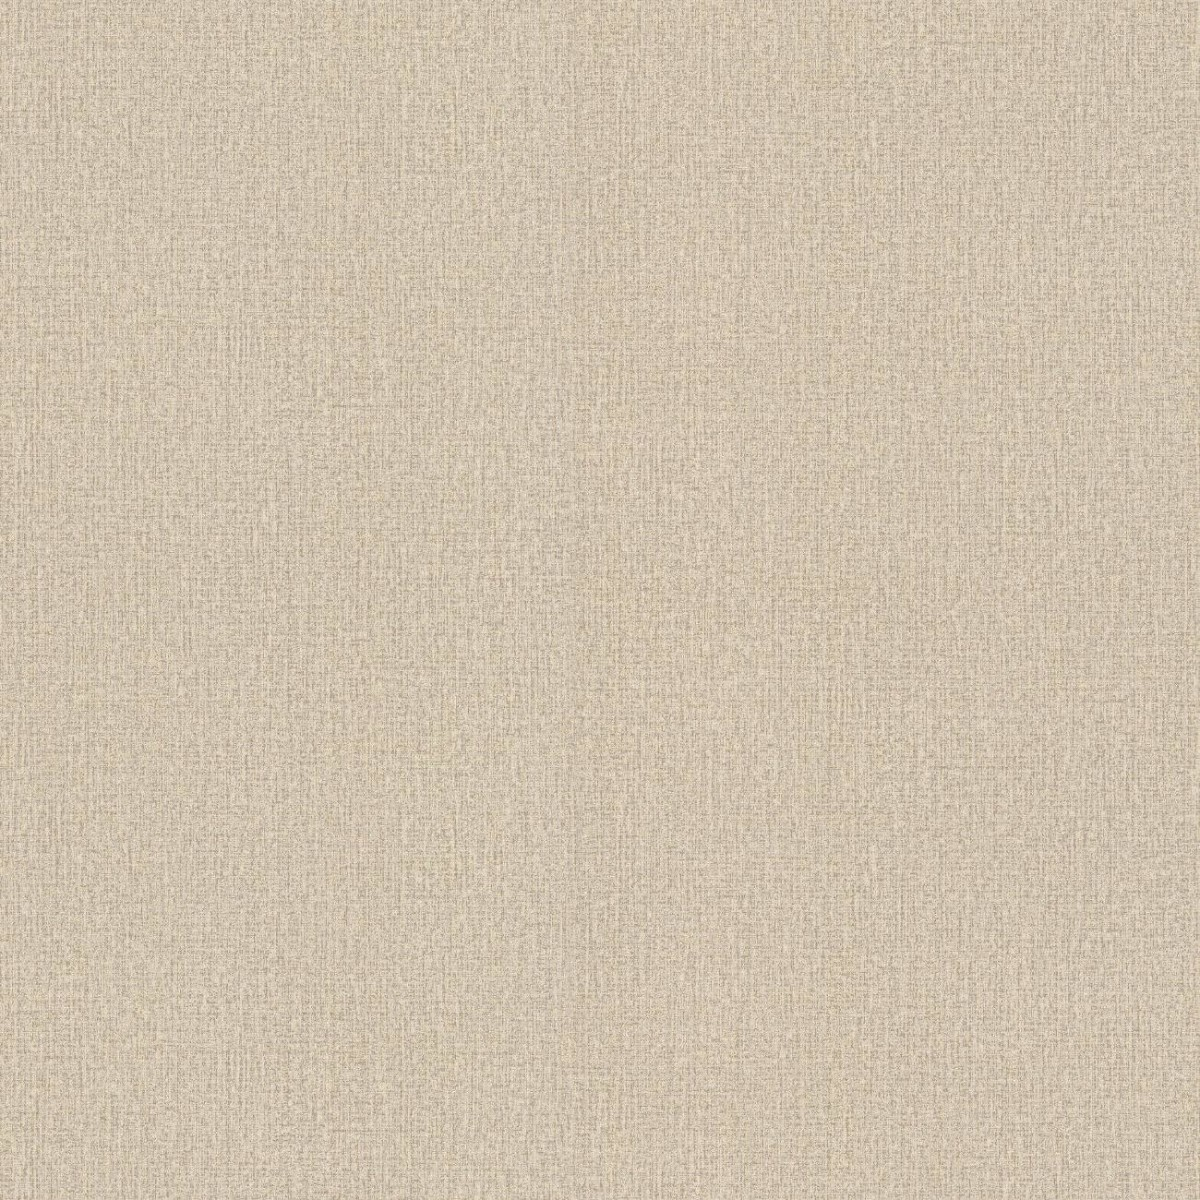 Обои флизелиновые Мир Авангард бежевые 1.06 м 11-235-03